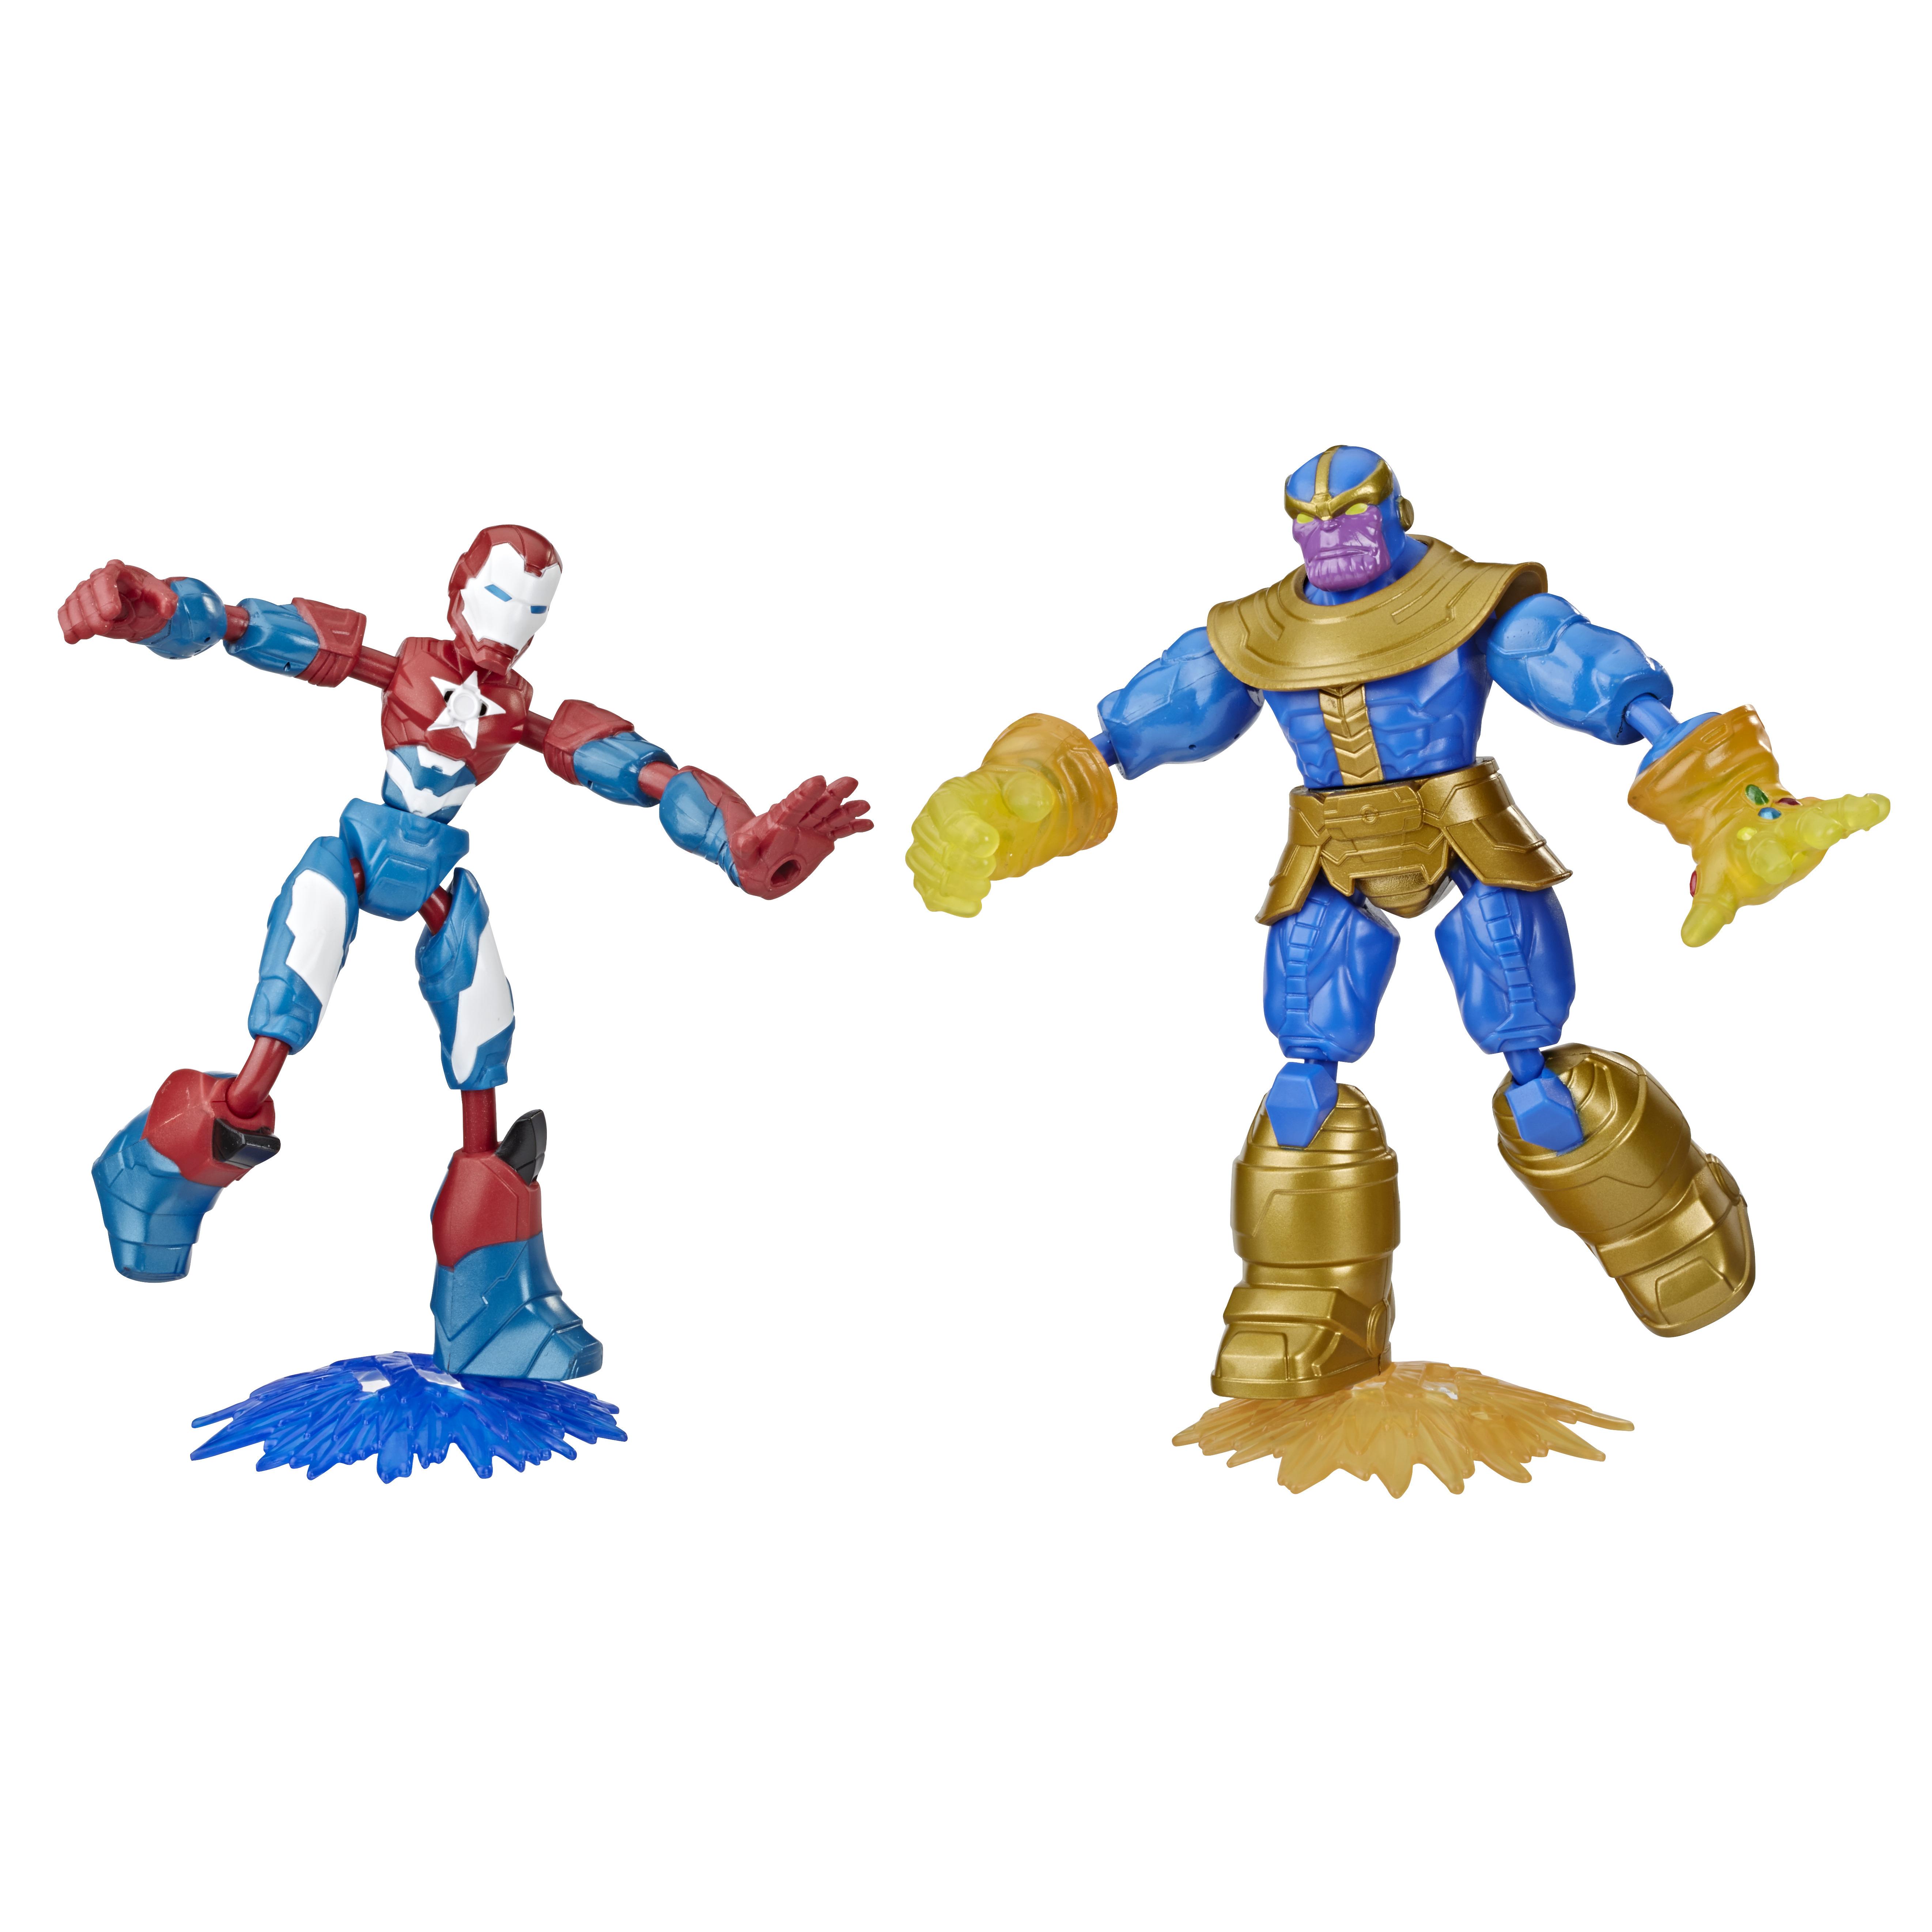 Conjunto De Bonecos Articulados - Disney - Marvel - Bend And Flex - Iron Patriot e Thanos - Hasbro